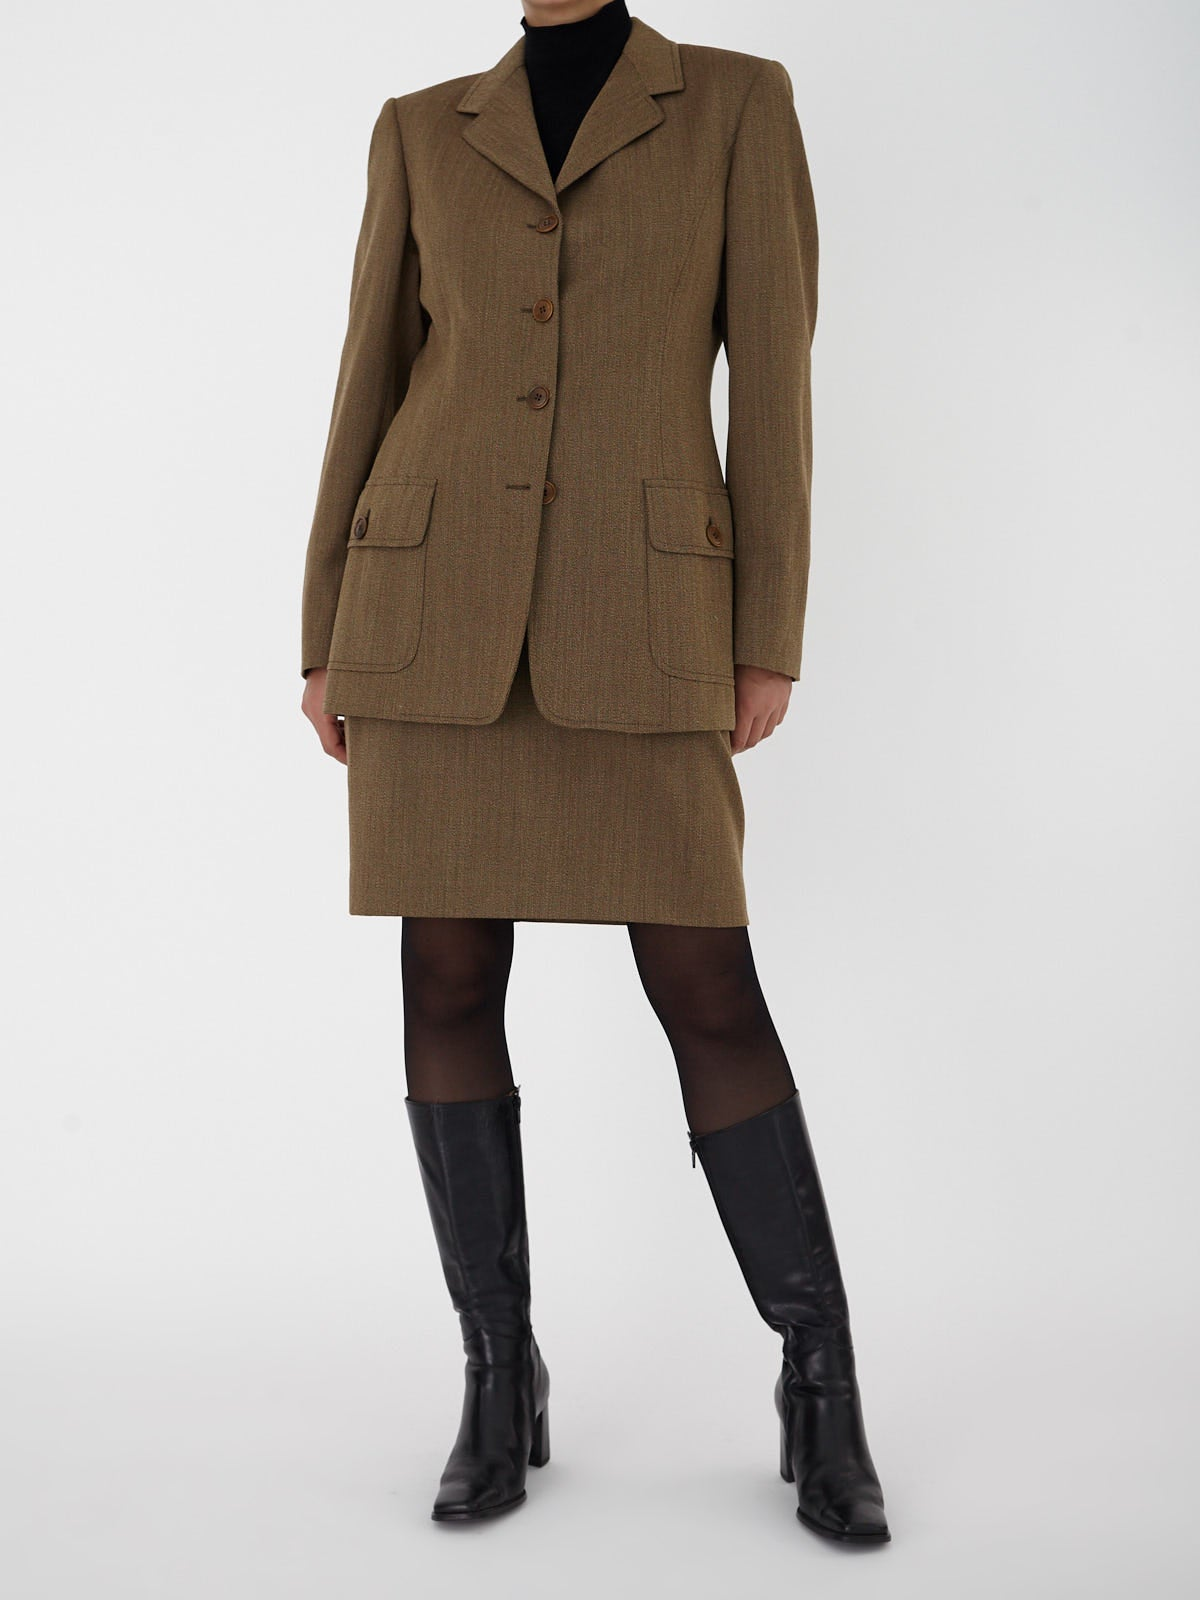 Burberry Skirt Suit